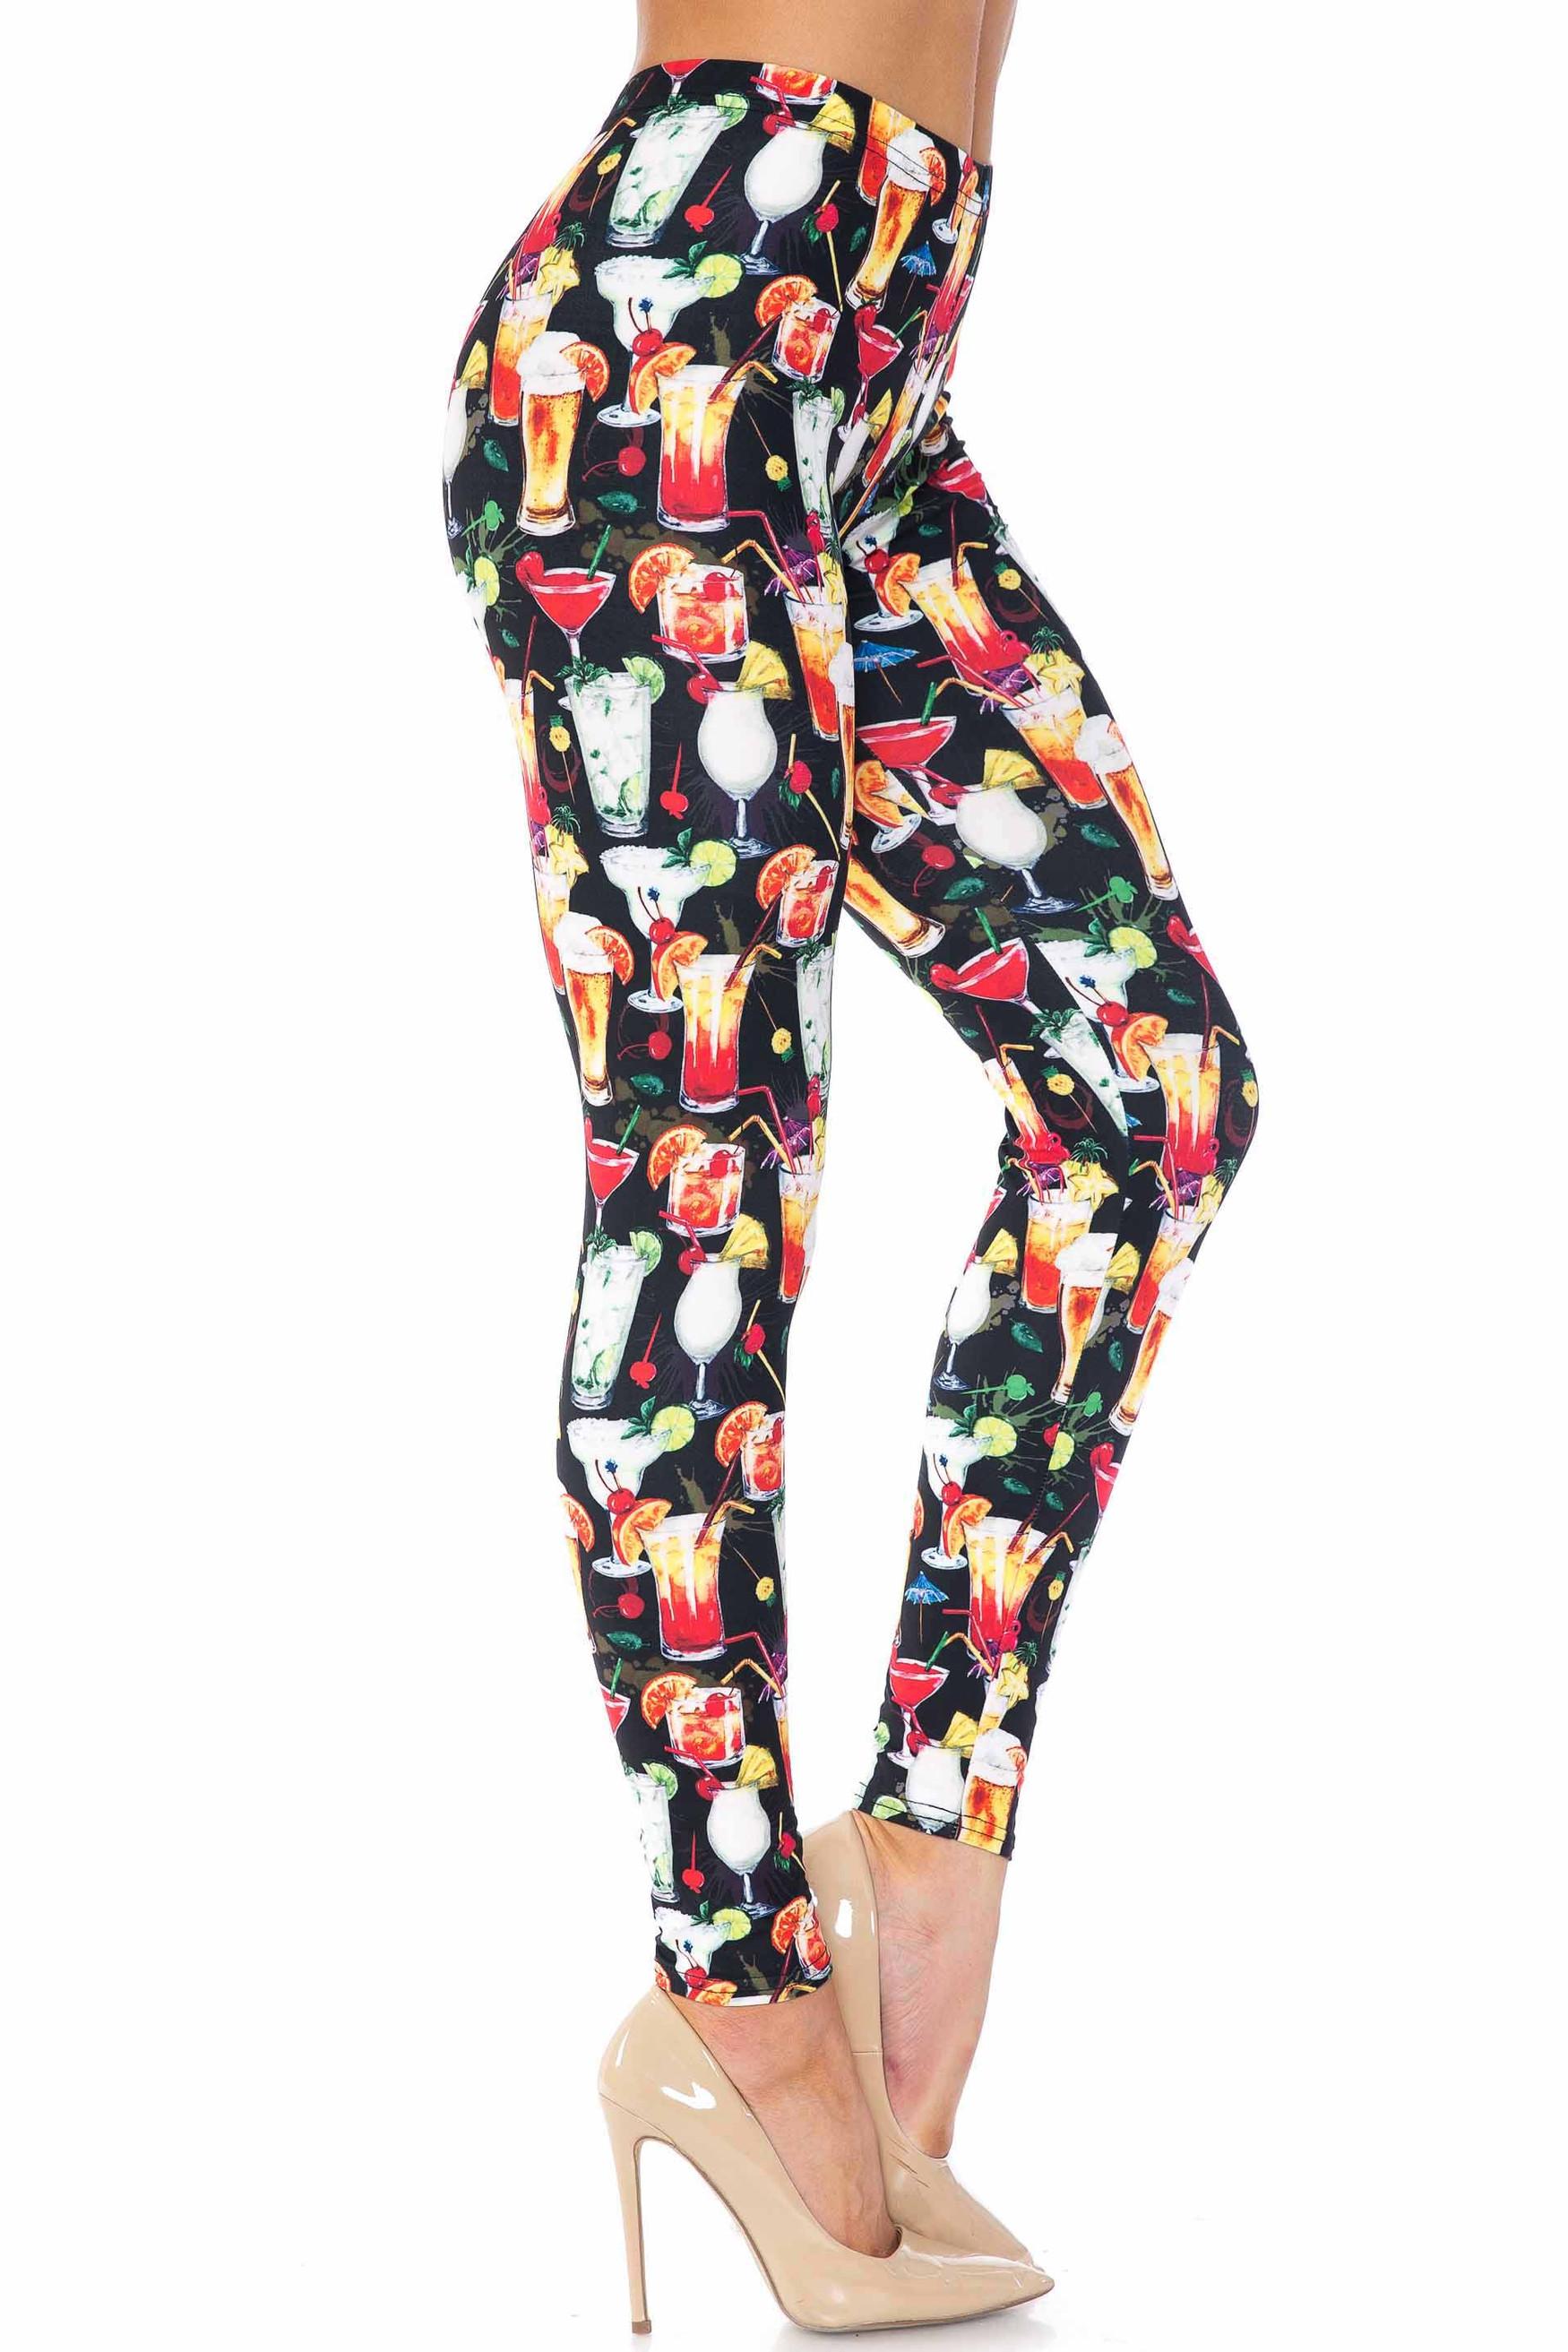 Creamy Soft Tropical Cocktails Plus Size Leggings - USA Fashion™